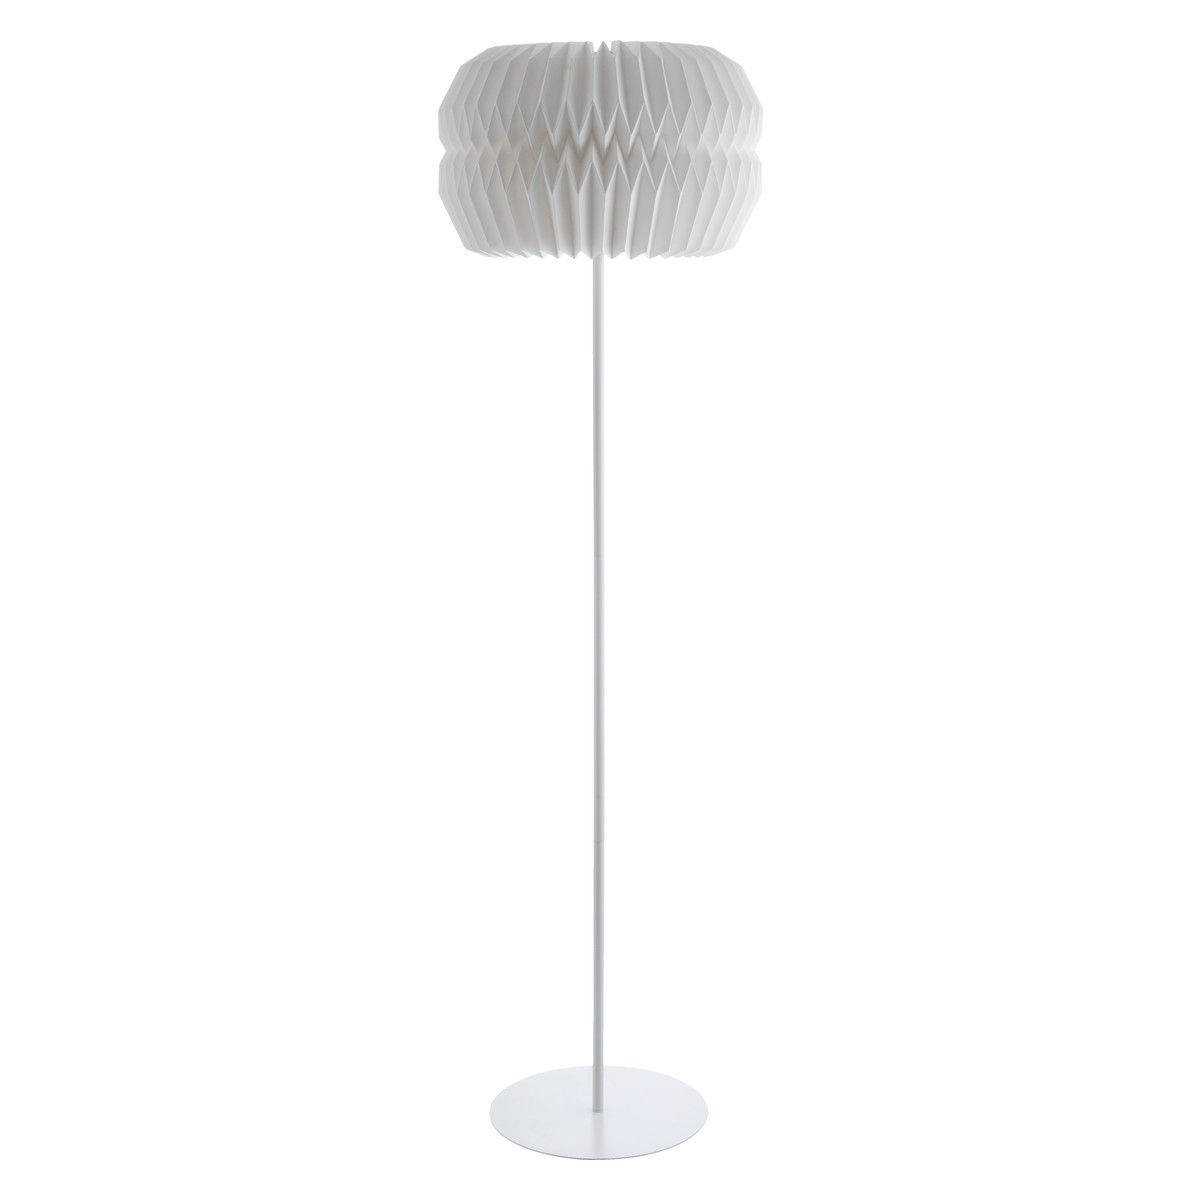 Unique white floor lamps - Kasha Light Grey Textured Fabric Footstool